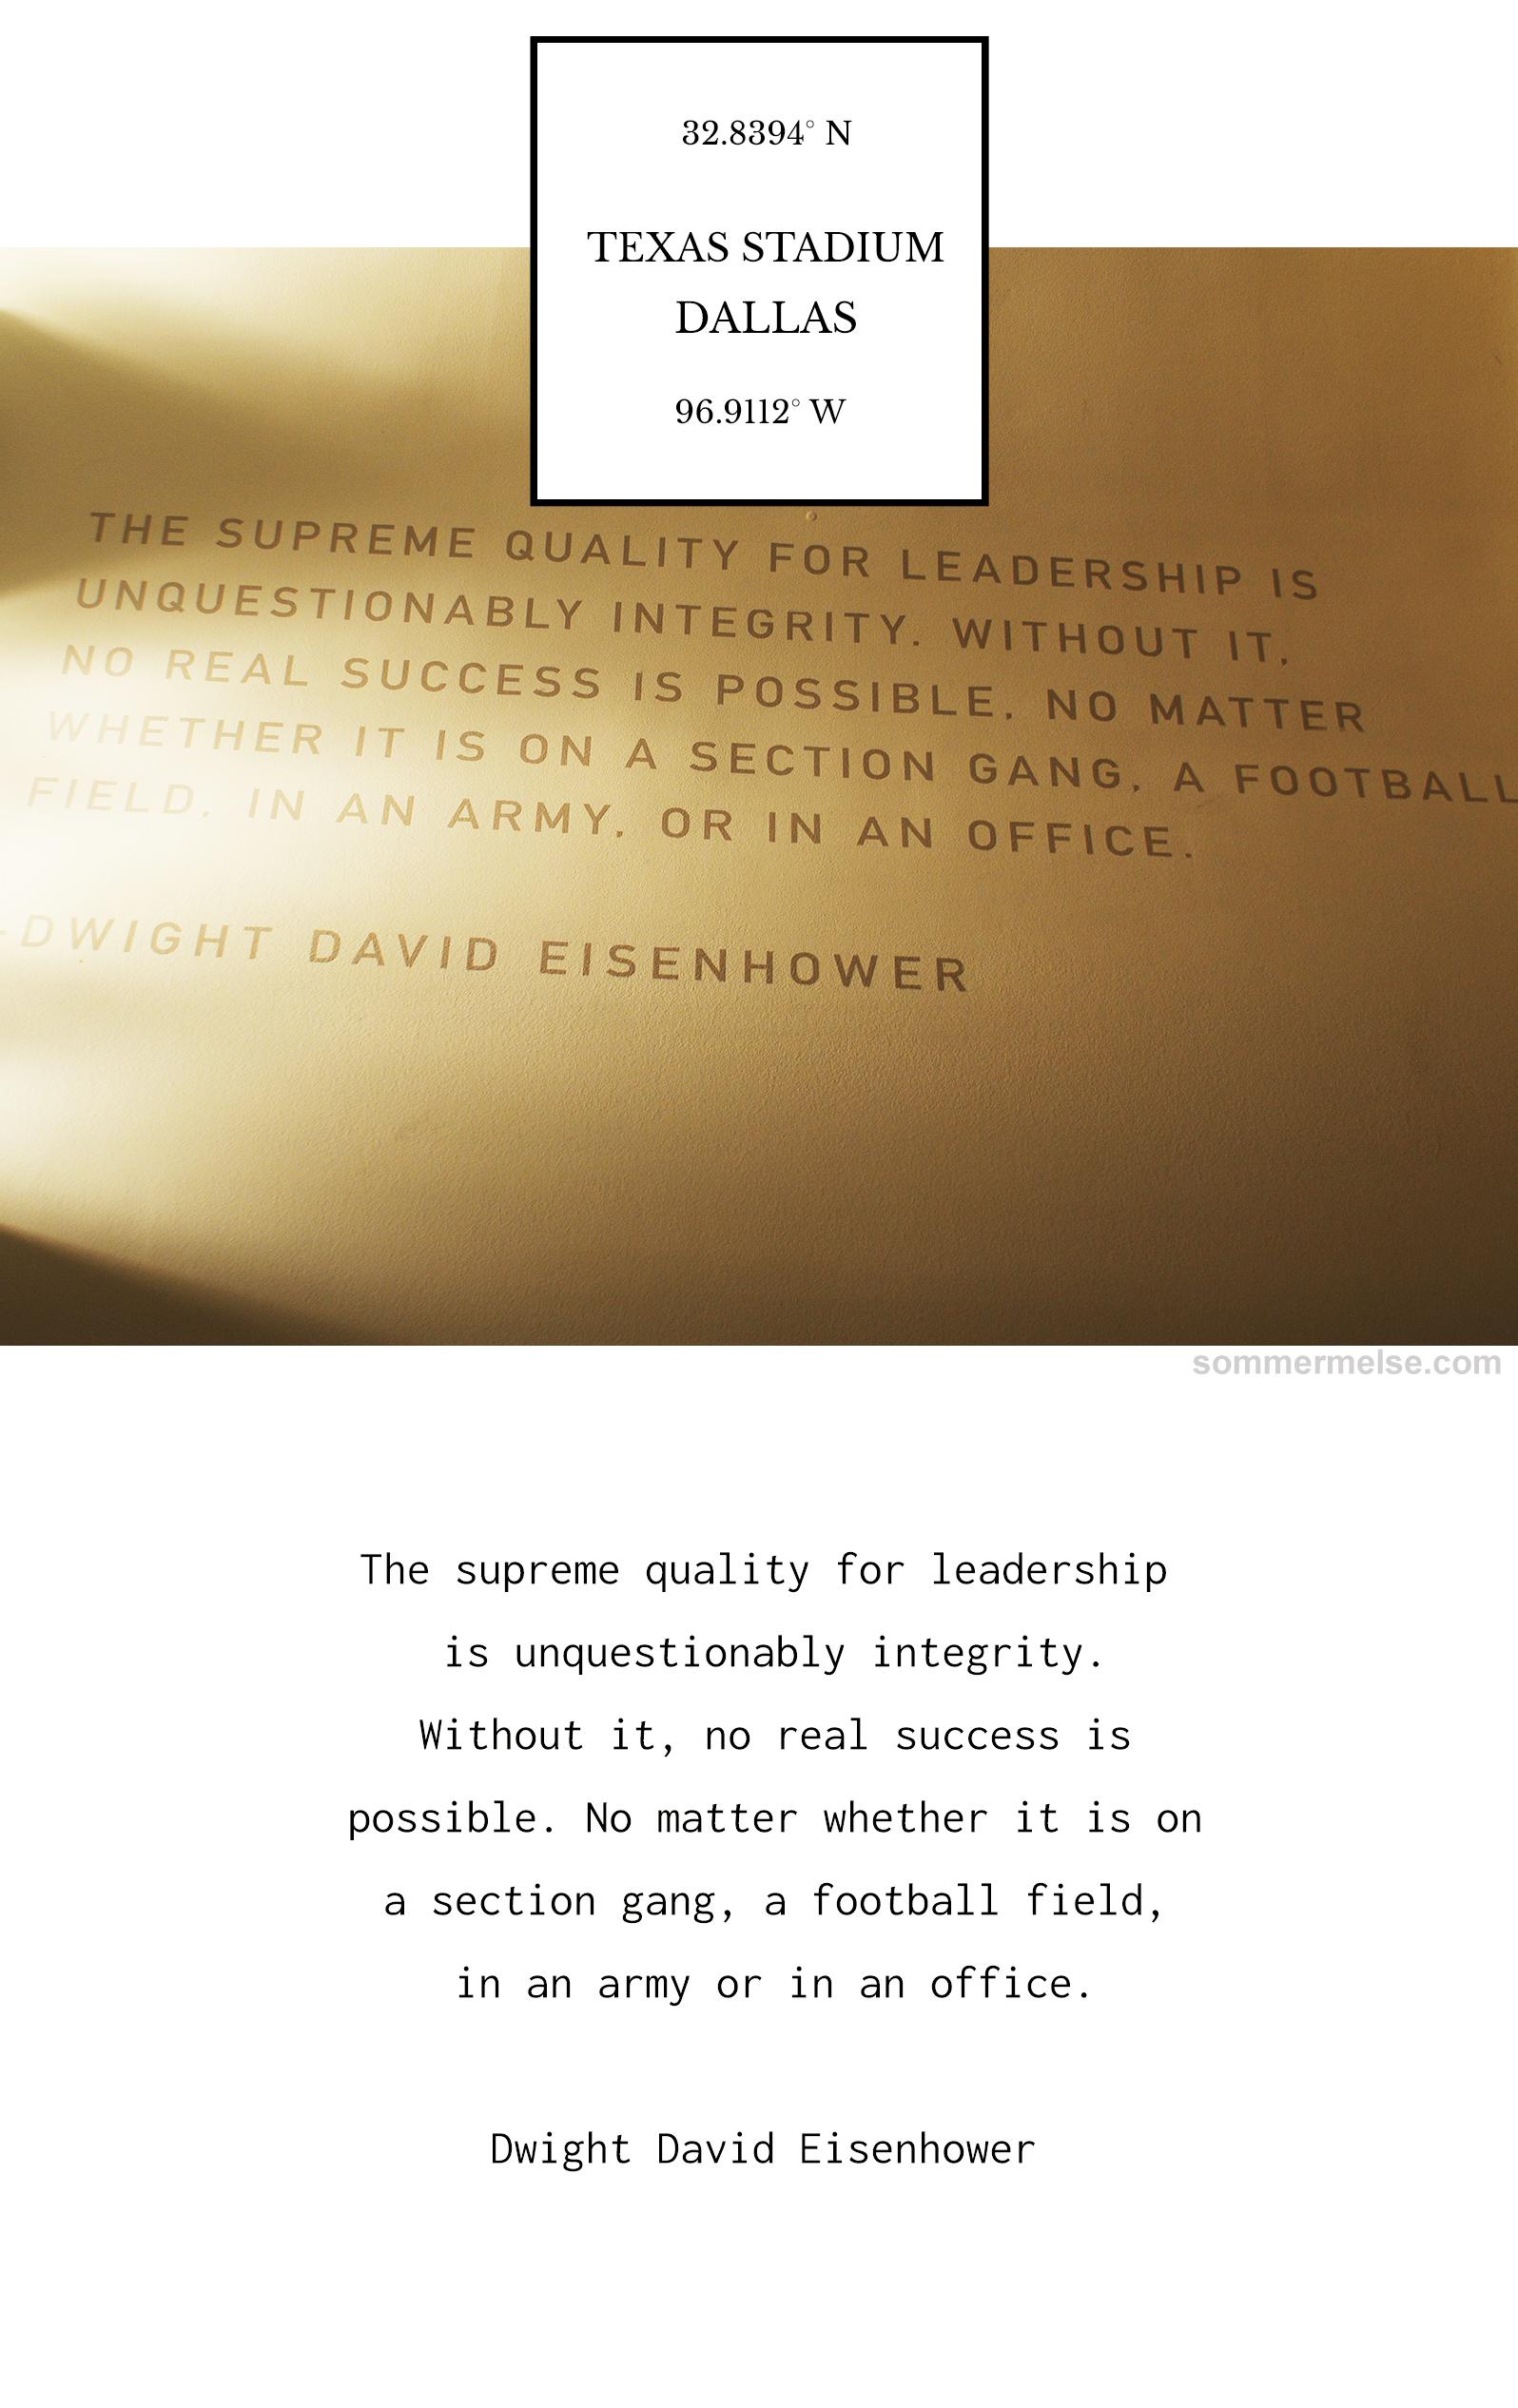 46_finding_wonder_texas_stadium_integrity_dwight_david_eisenhower